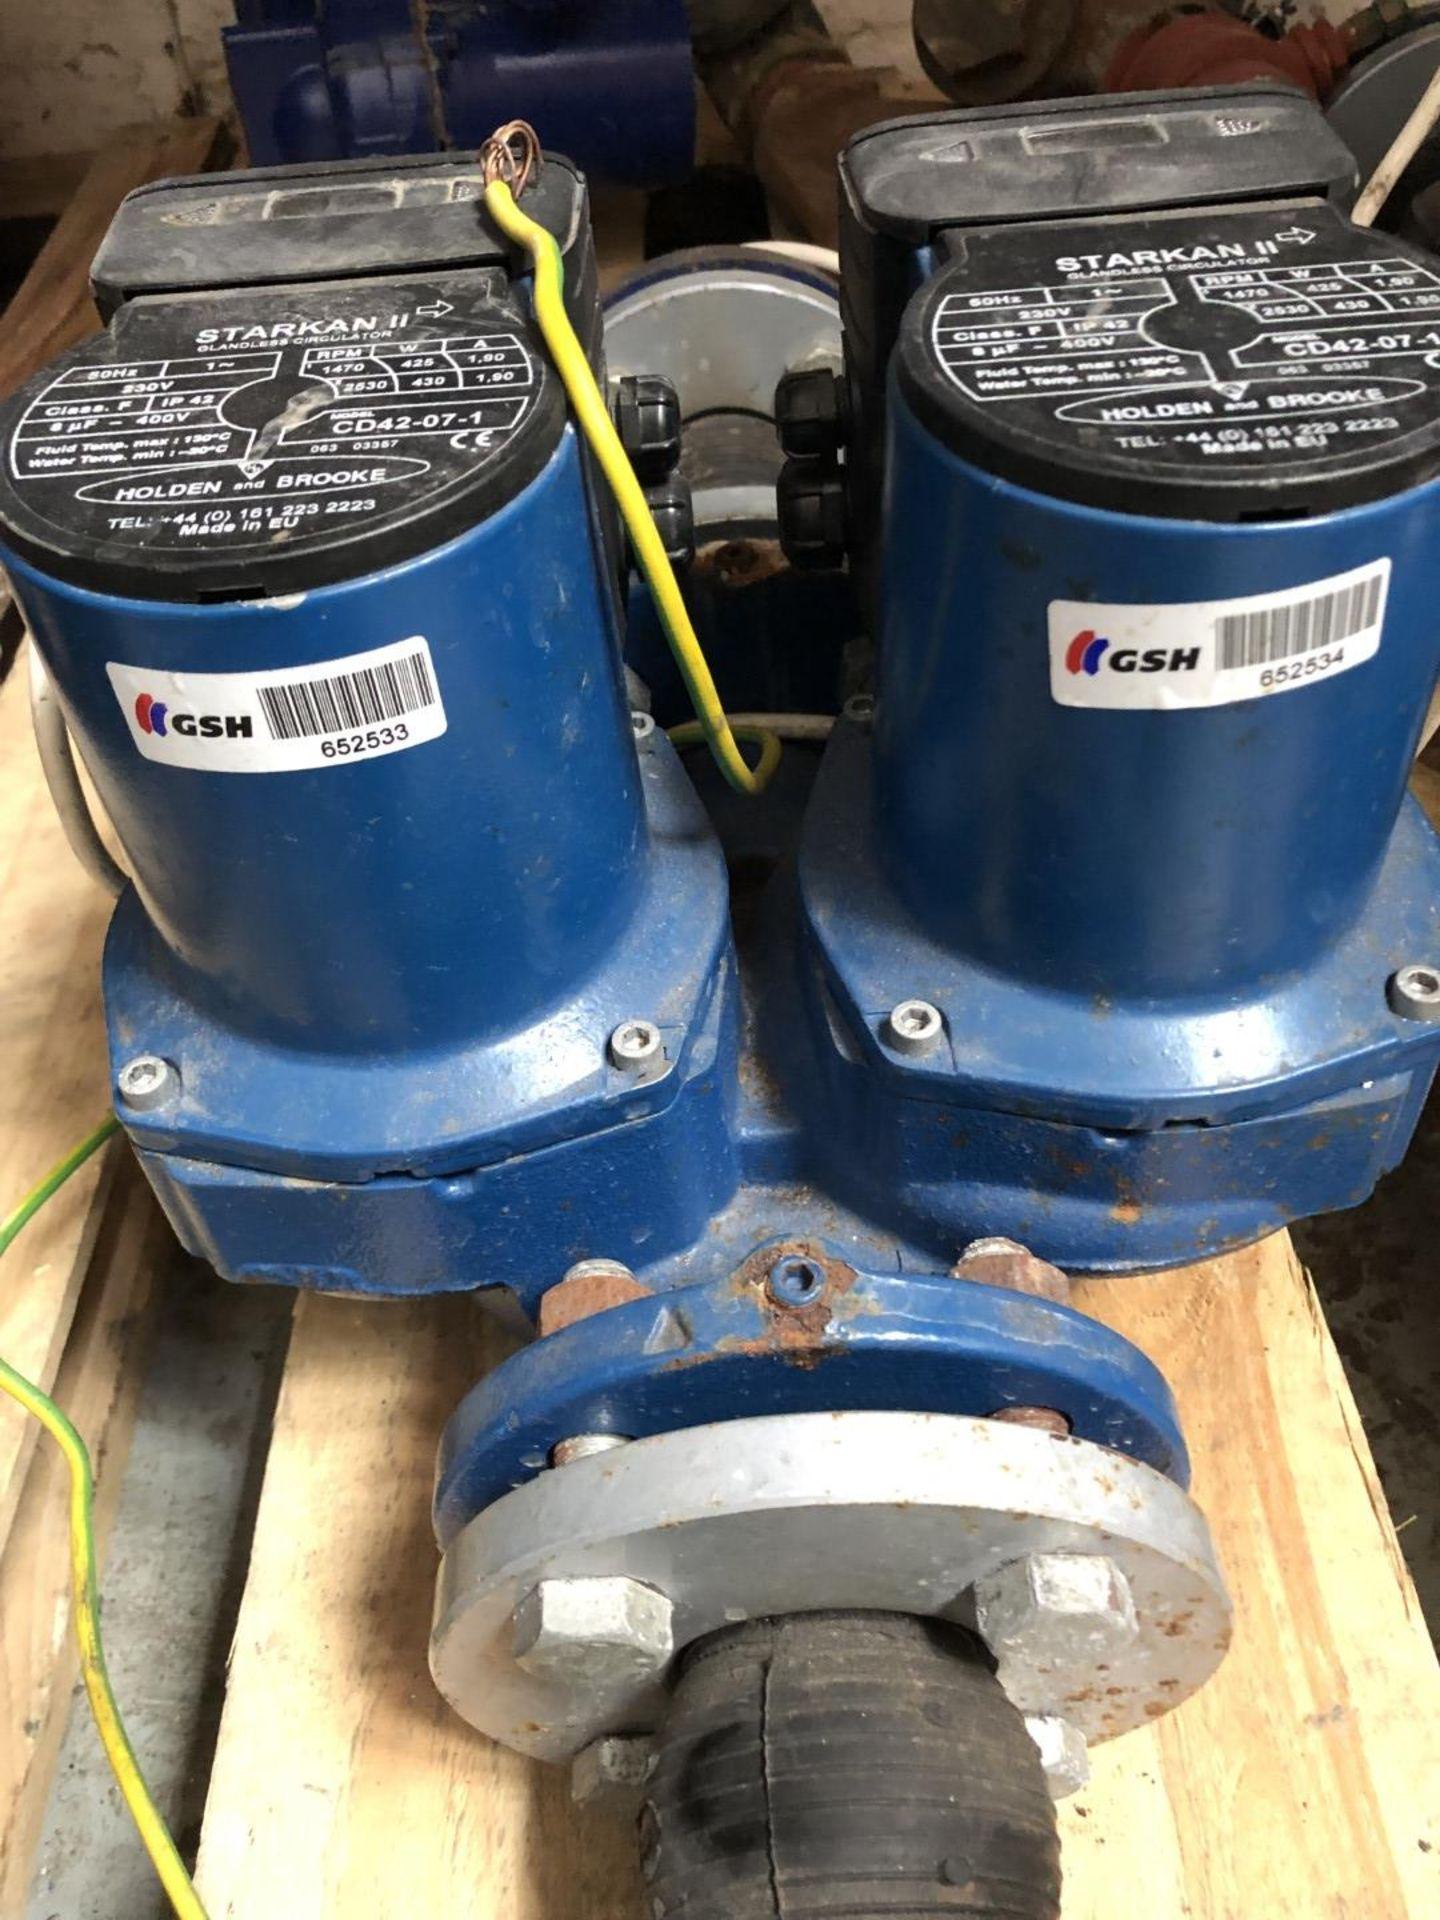 Lot 6030 - 1 x Large Blue Twin Head Starkan Glandless Circulator - NP005 - CL344 - Location: Altrincham WA14